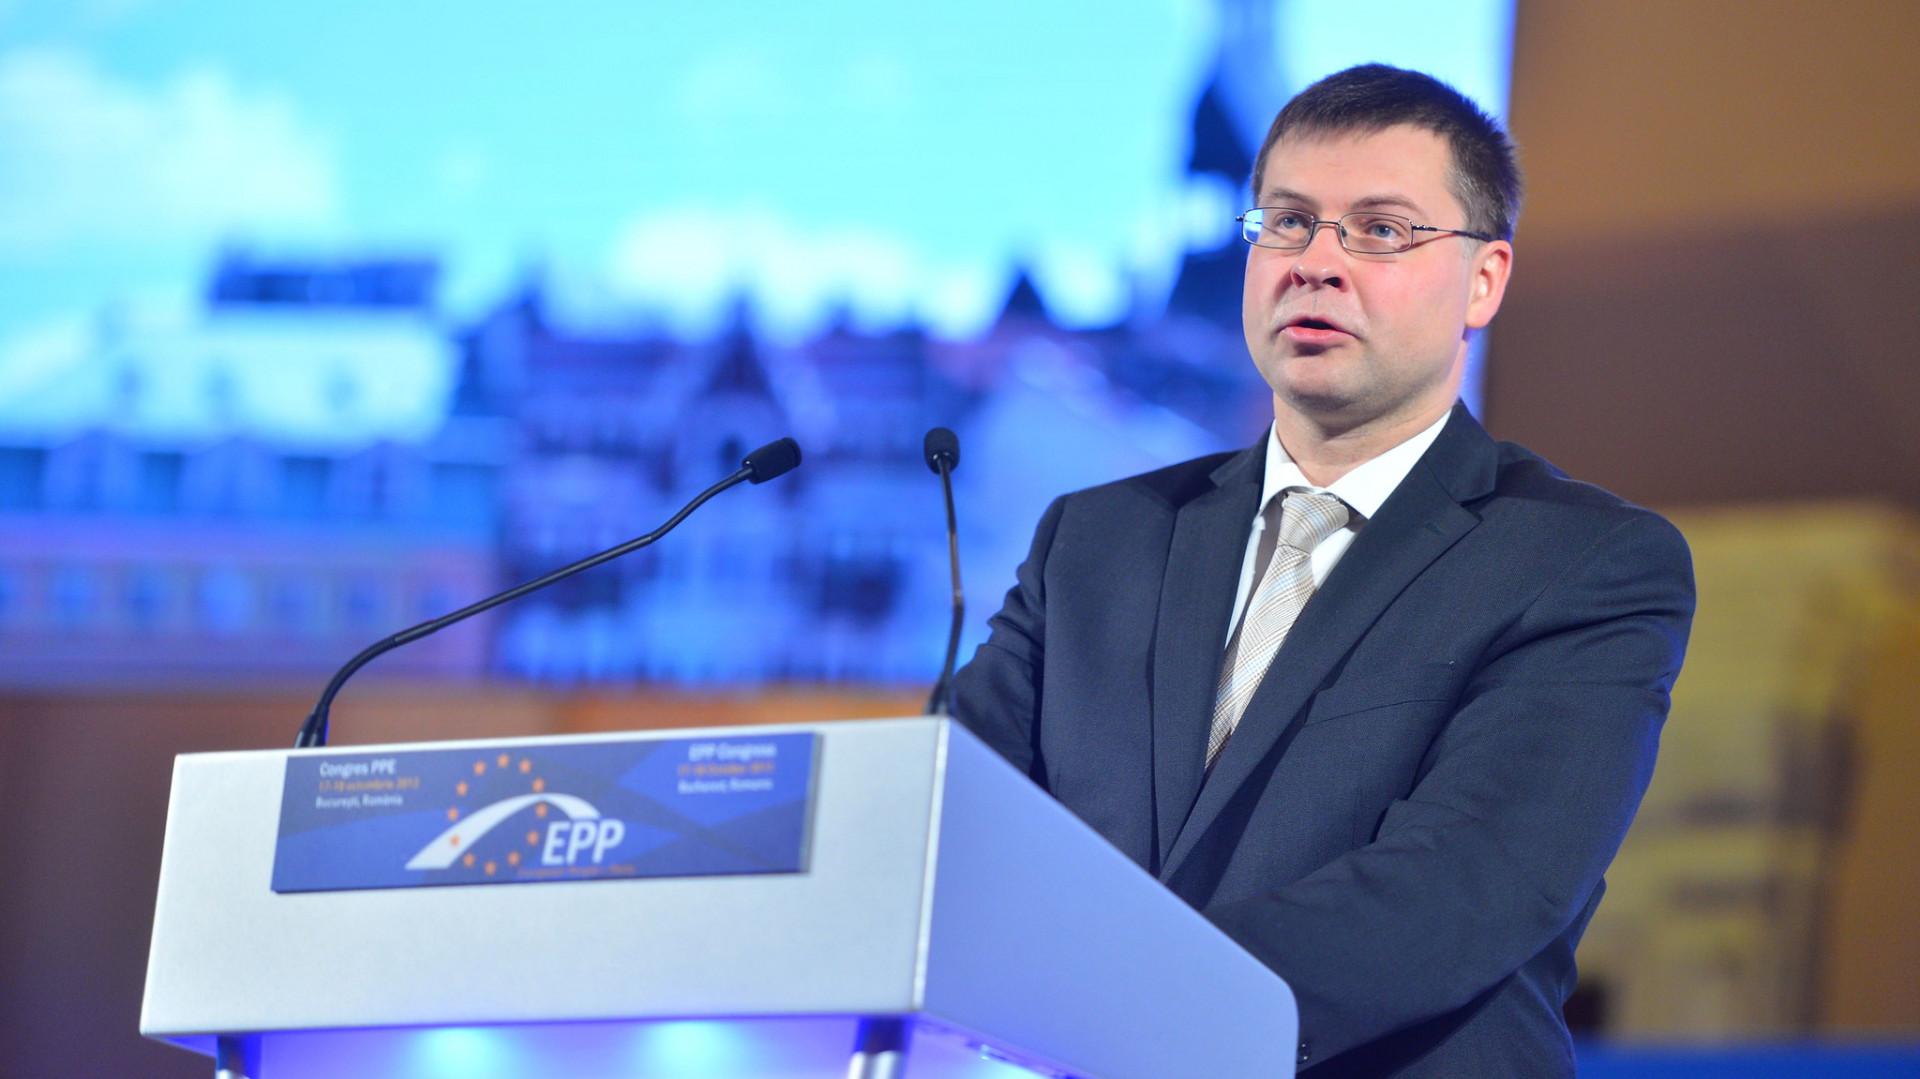 Valdis Dombrovskis (fot. flickr.com/eppofficial)